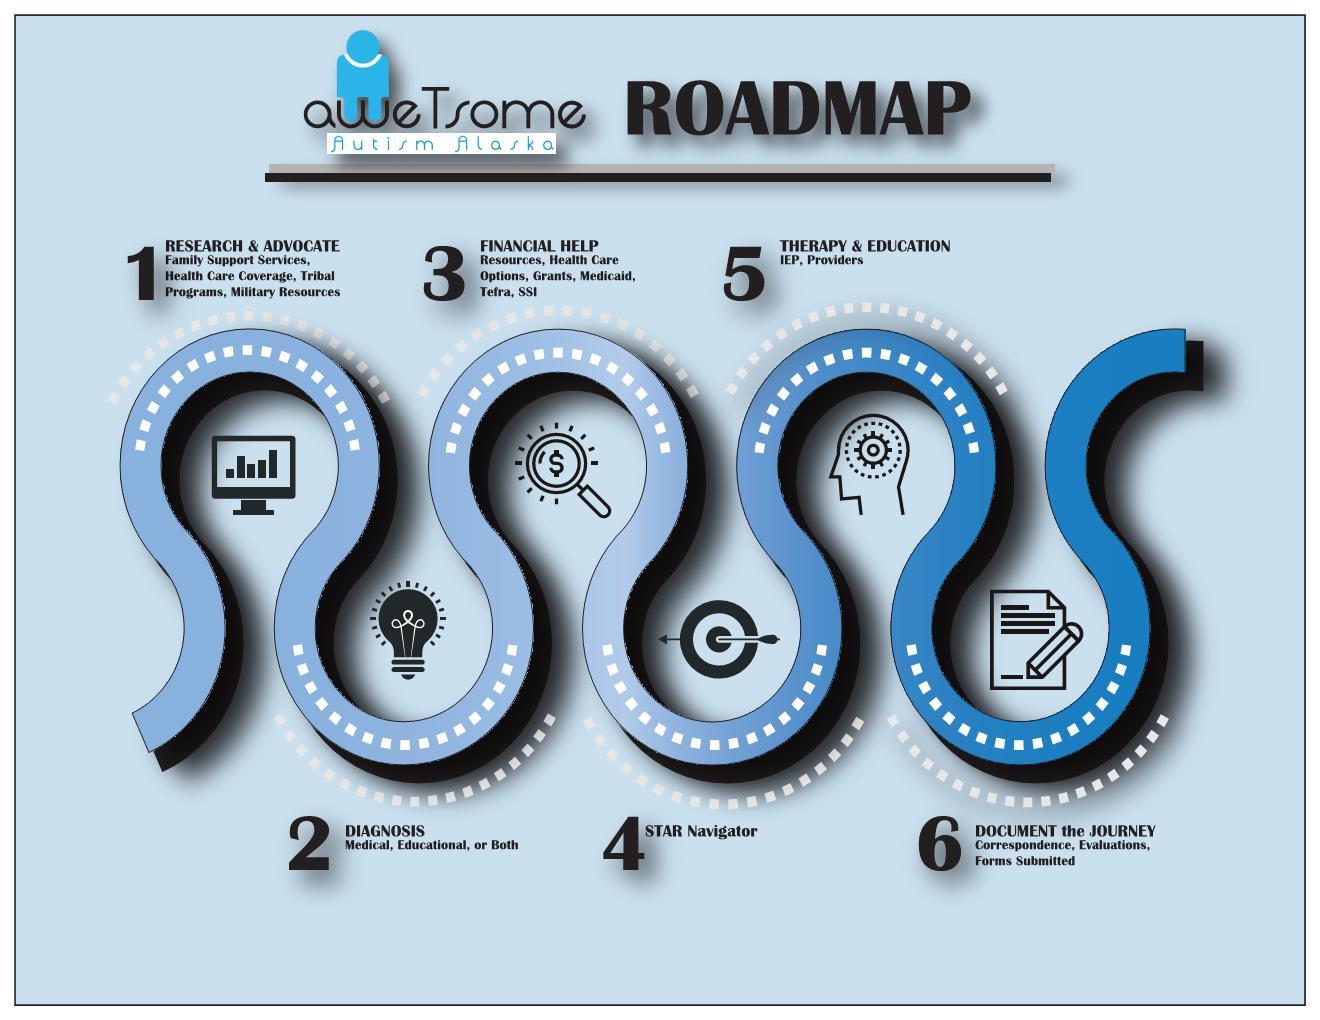 RoadmapLandscapev1.jpg